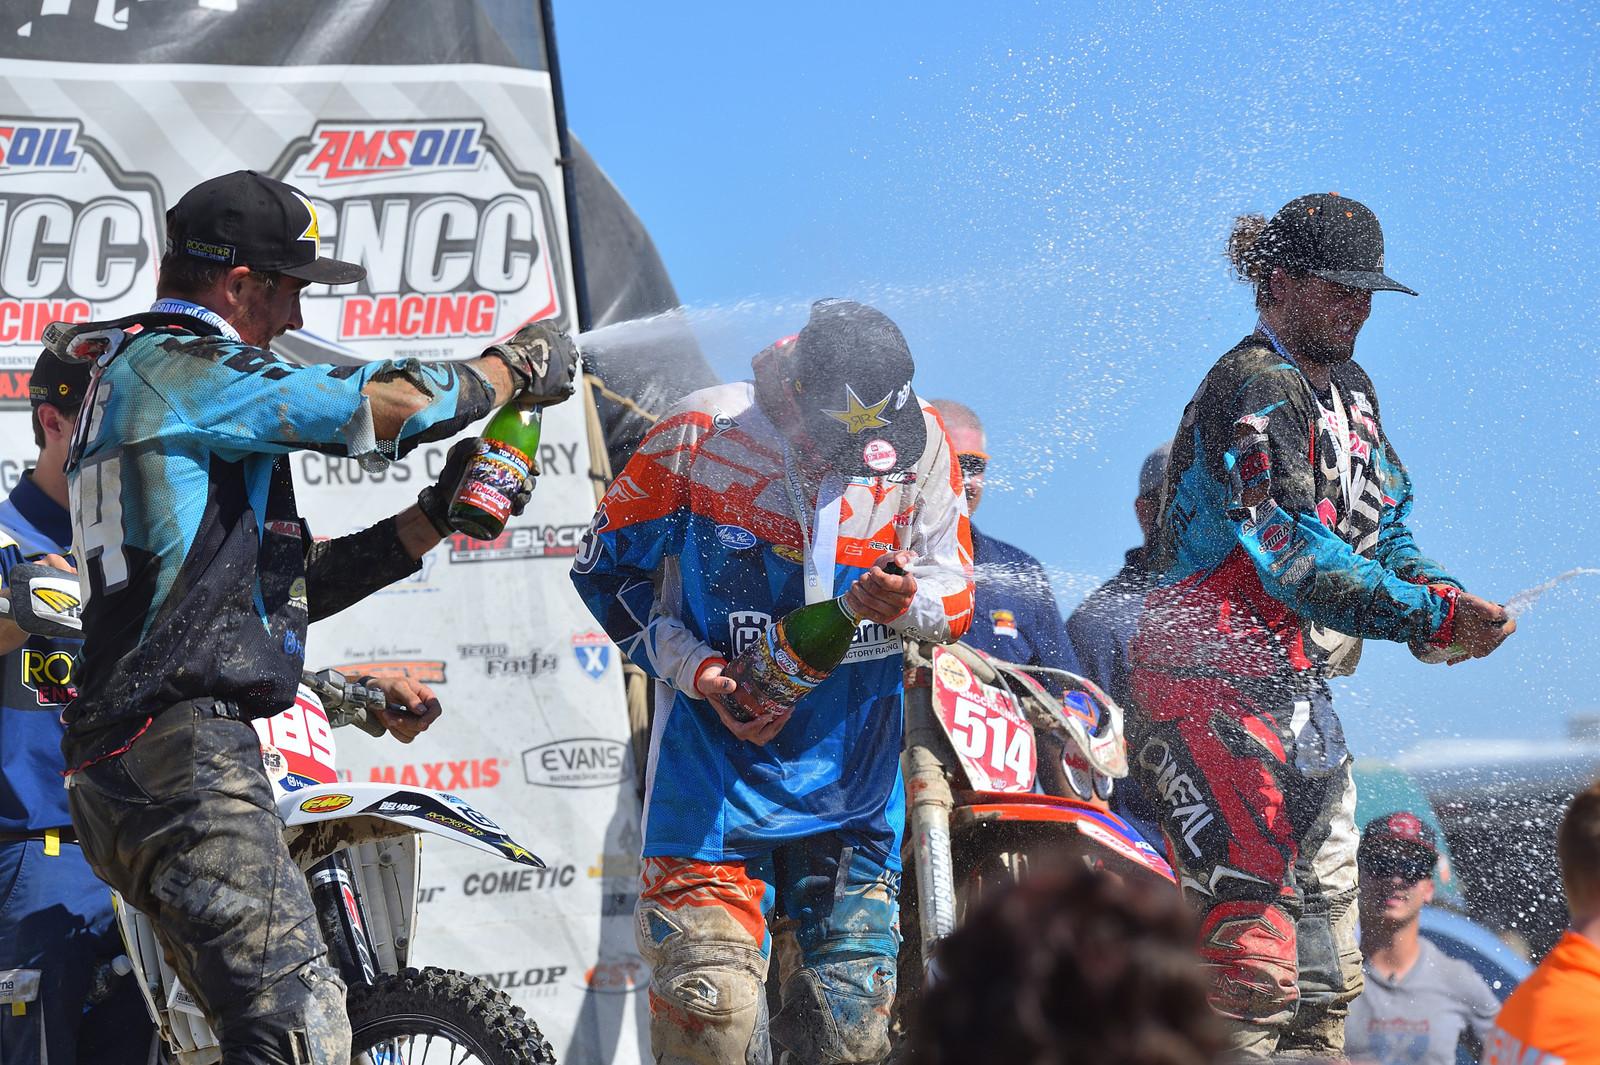 Podium - Tomahawk GNCC - Motocross Pictures - Vital MX